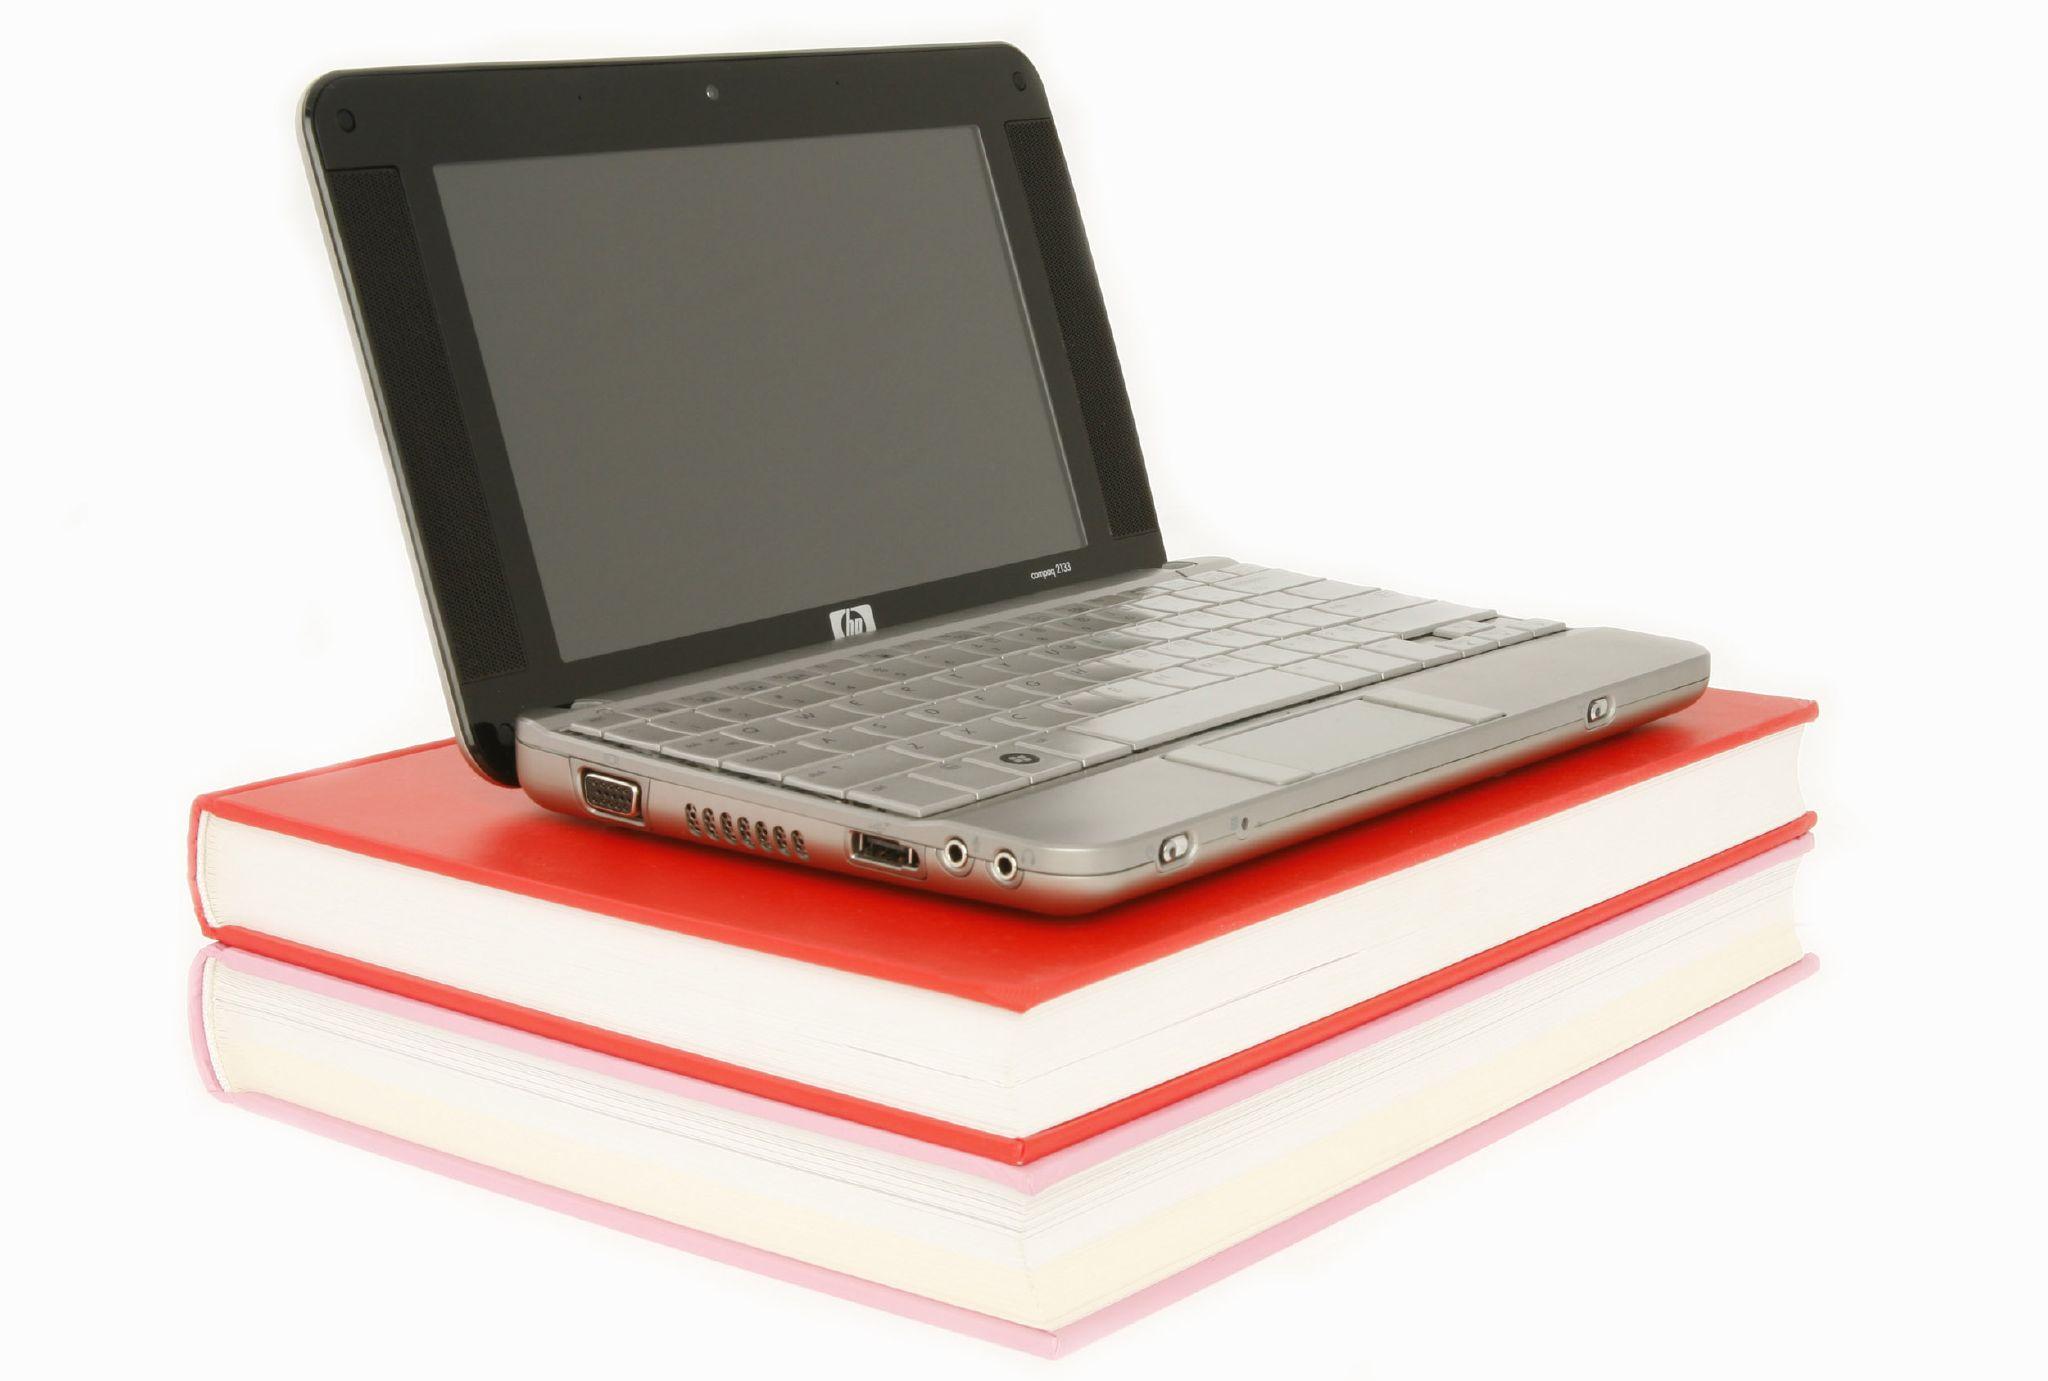 HP 2133 netbook